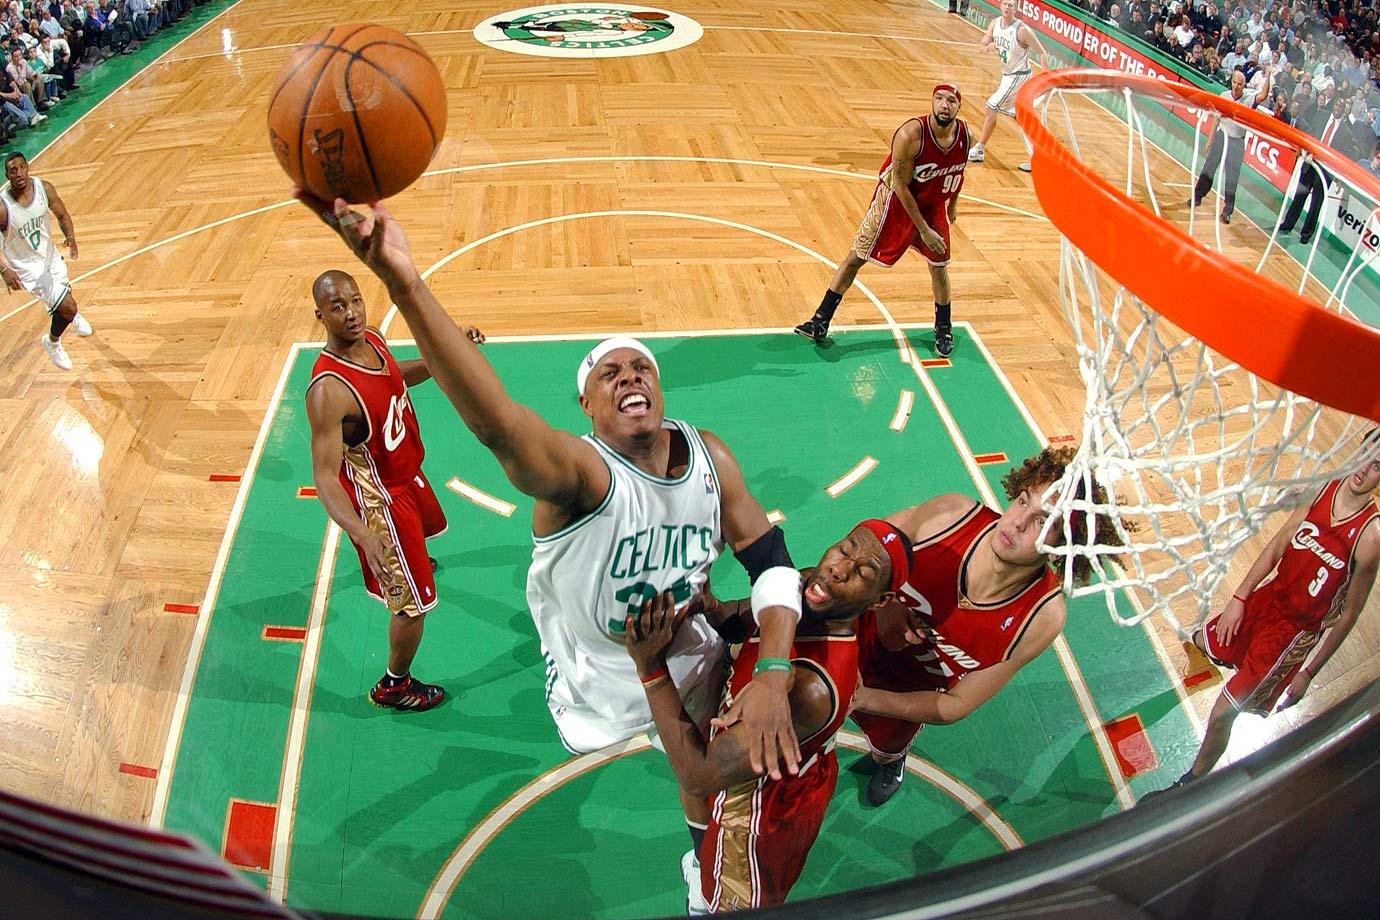 50 vs Cleveland (Feb. 15, 2006)